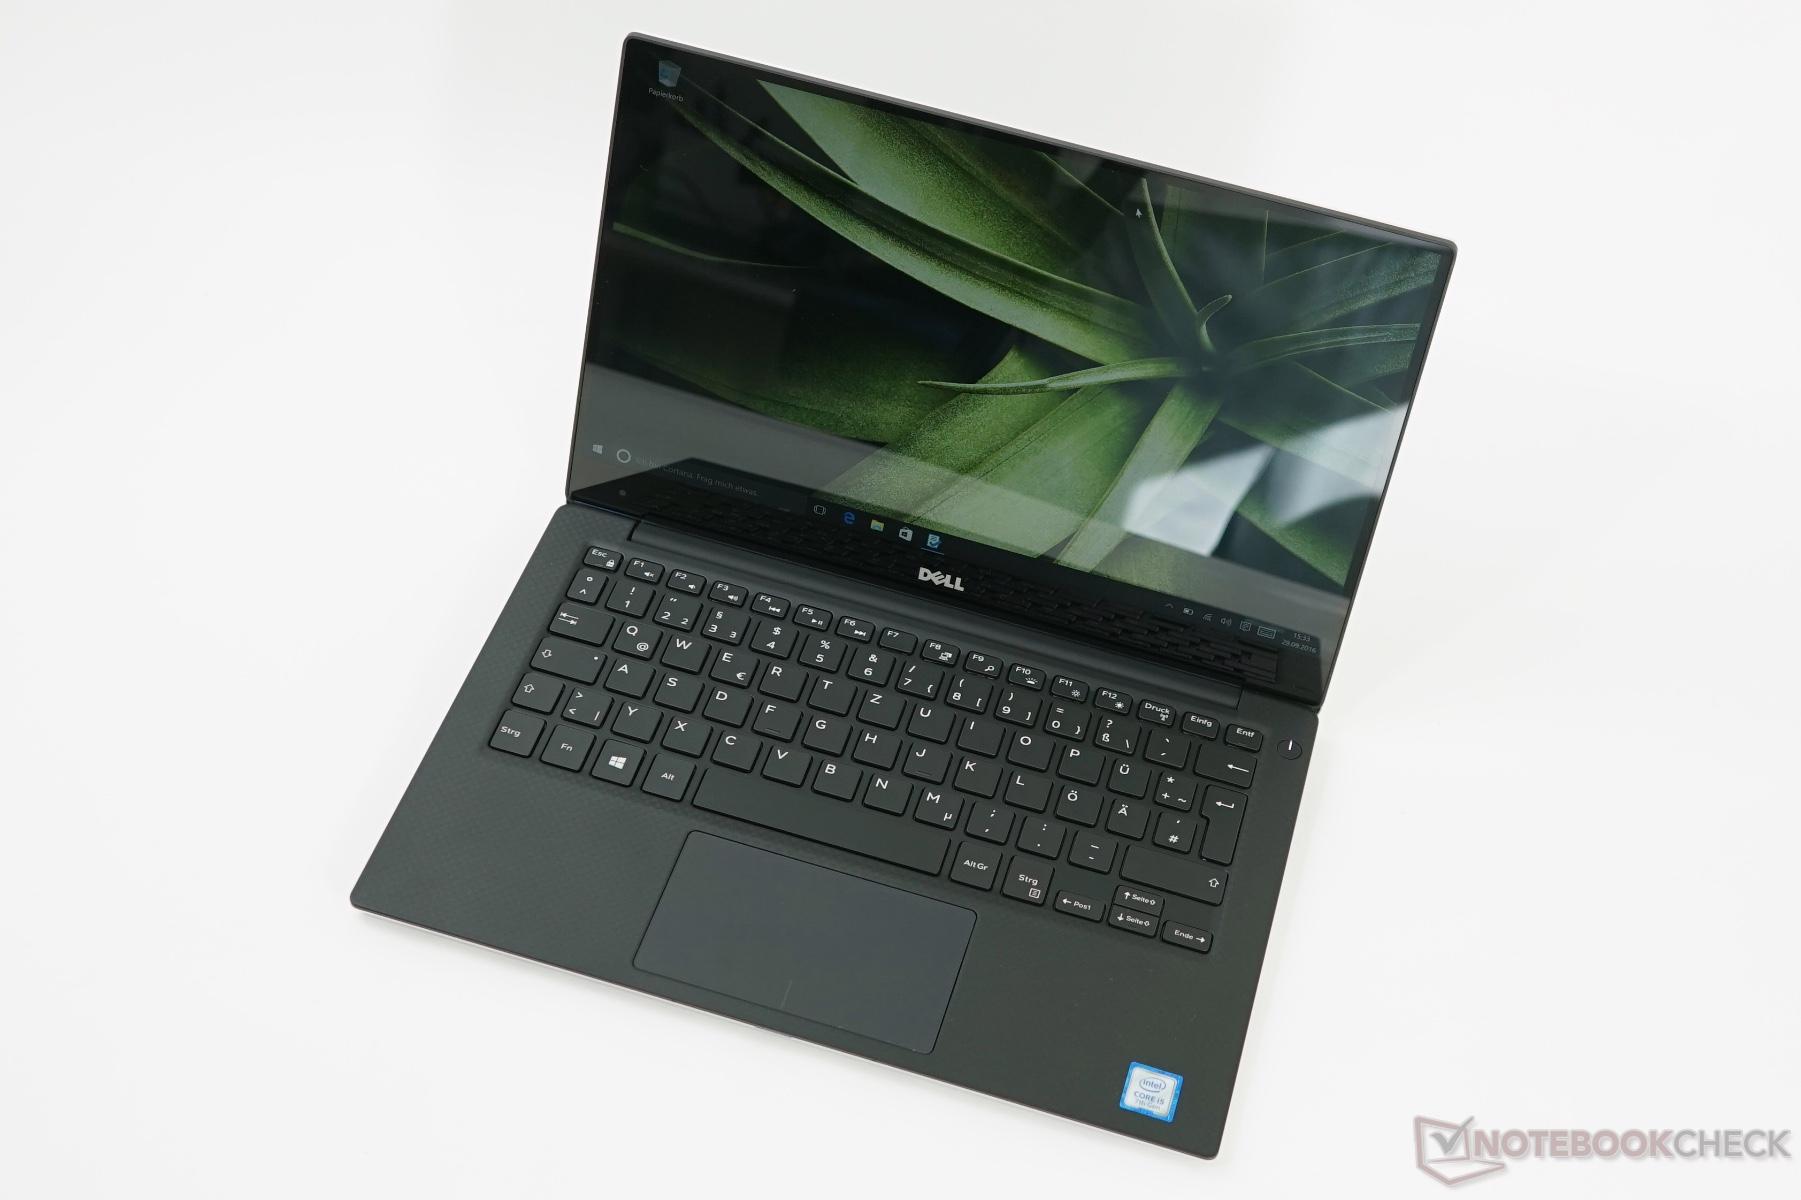 Dell XPS 13 9360 (FHD, i7, Iris) Laptop Review